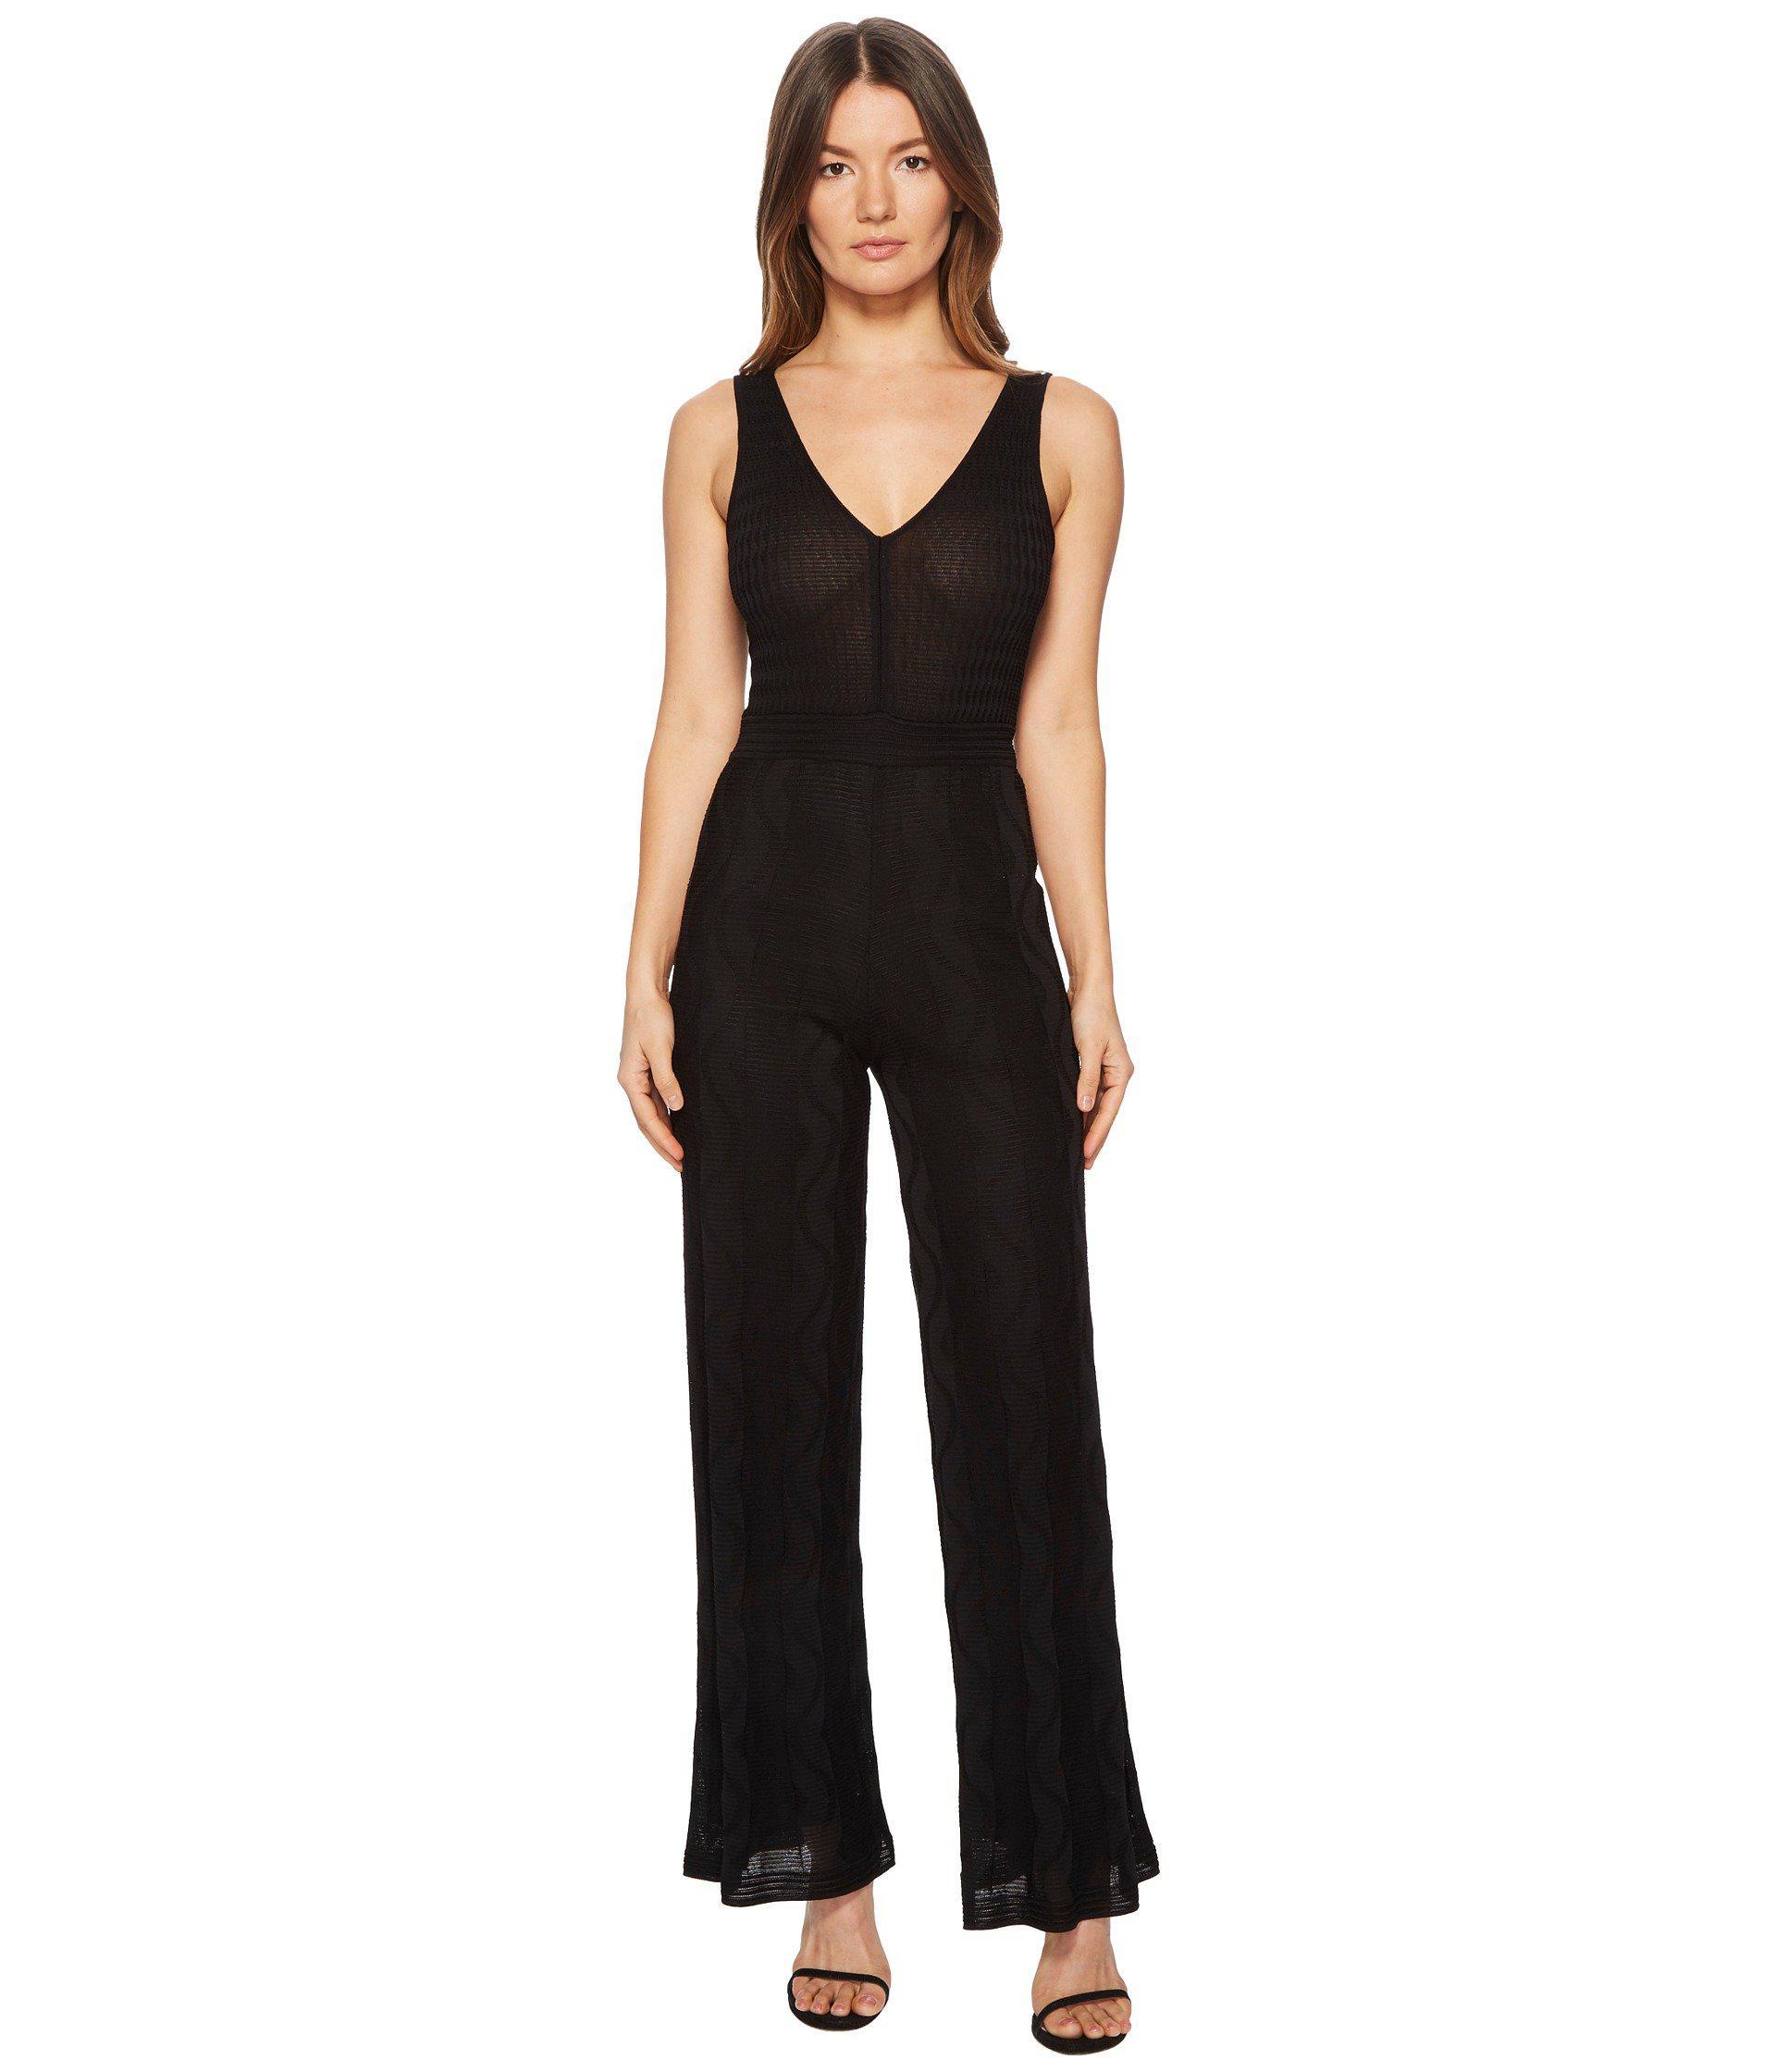 2d3cb78fe7 Lyst - M Missoni Solid Knit V-neck Jumpsuit in Black - Save 60%